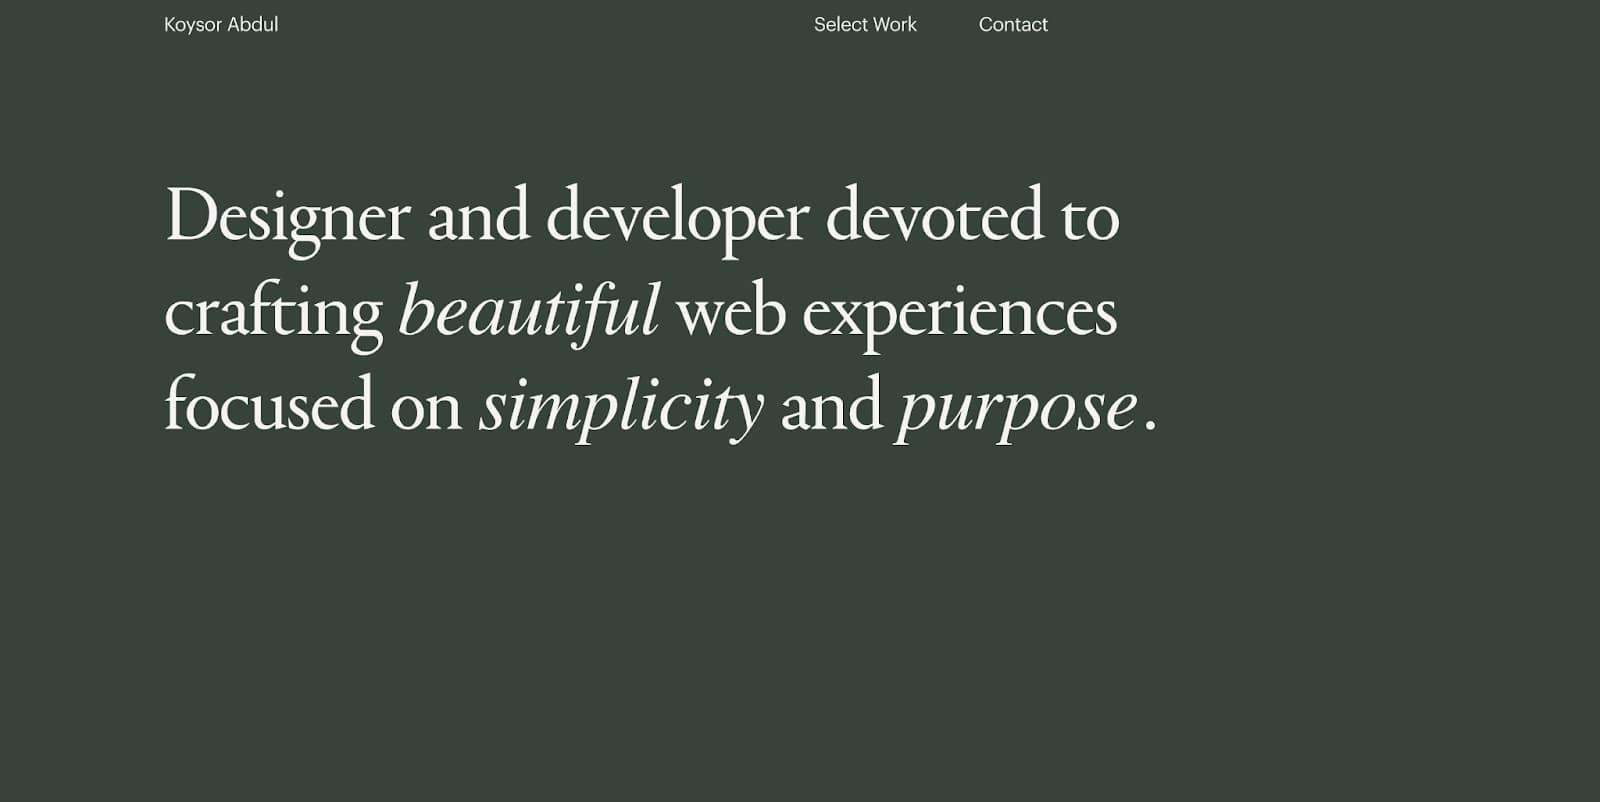 Screenshot of Koysor Abdul's portfolio homepage